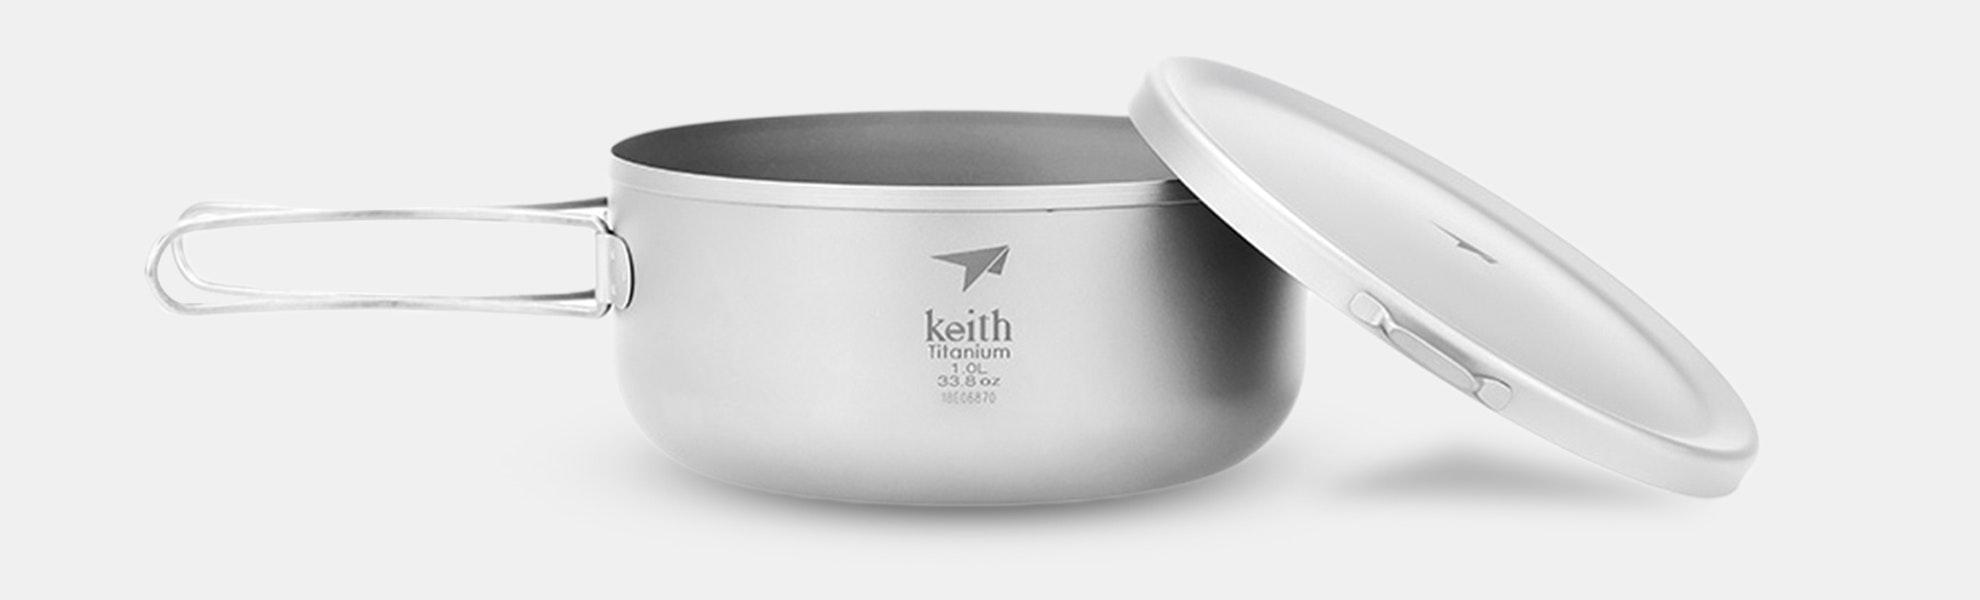 Keith Titanium Lunch Boxes